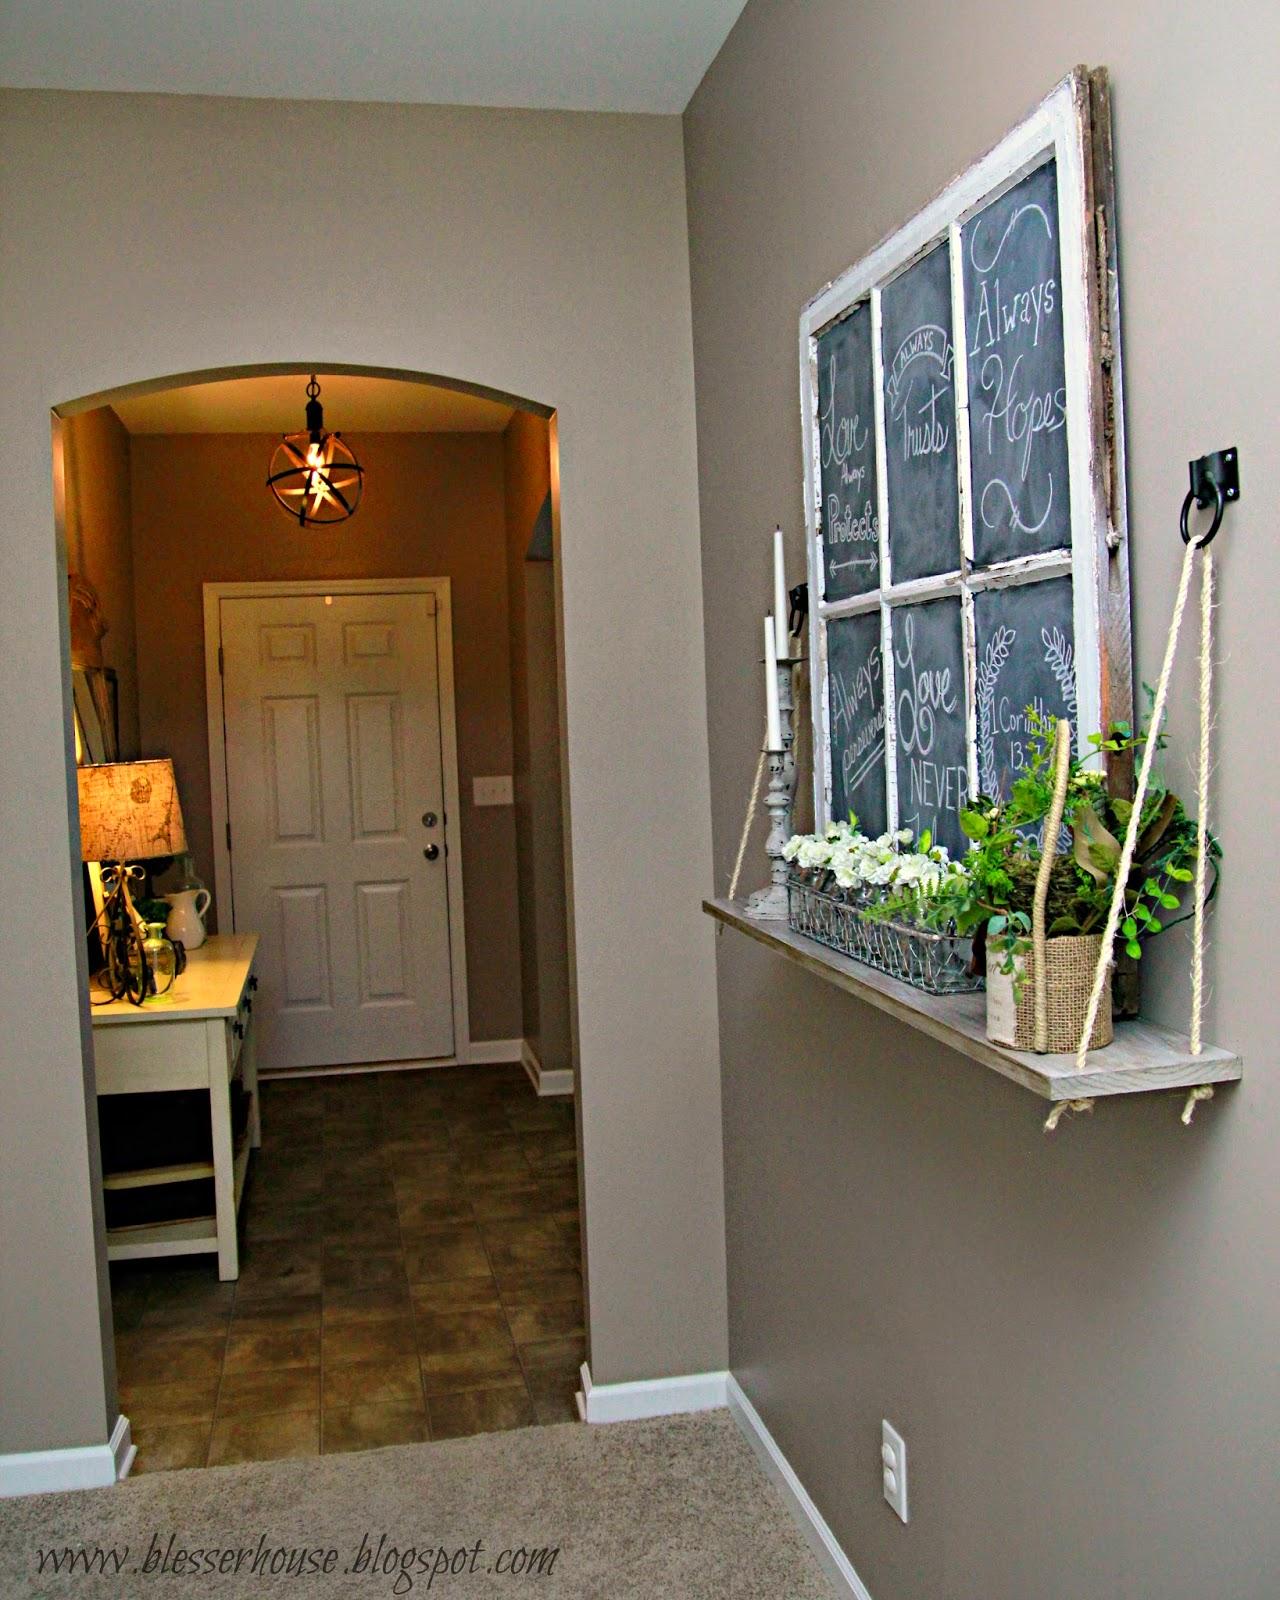 Wall Ledge Design Ideas : But first let me make a shelfie bless er house